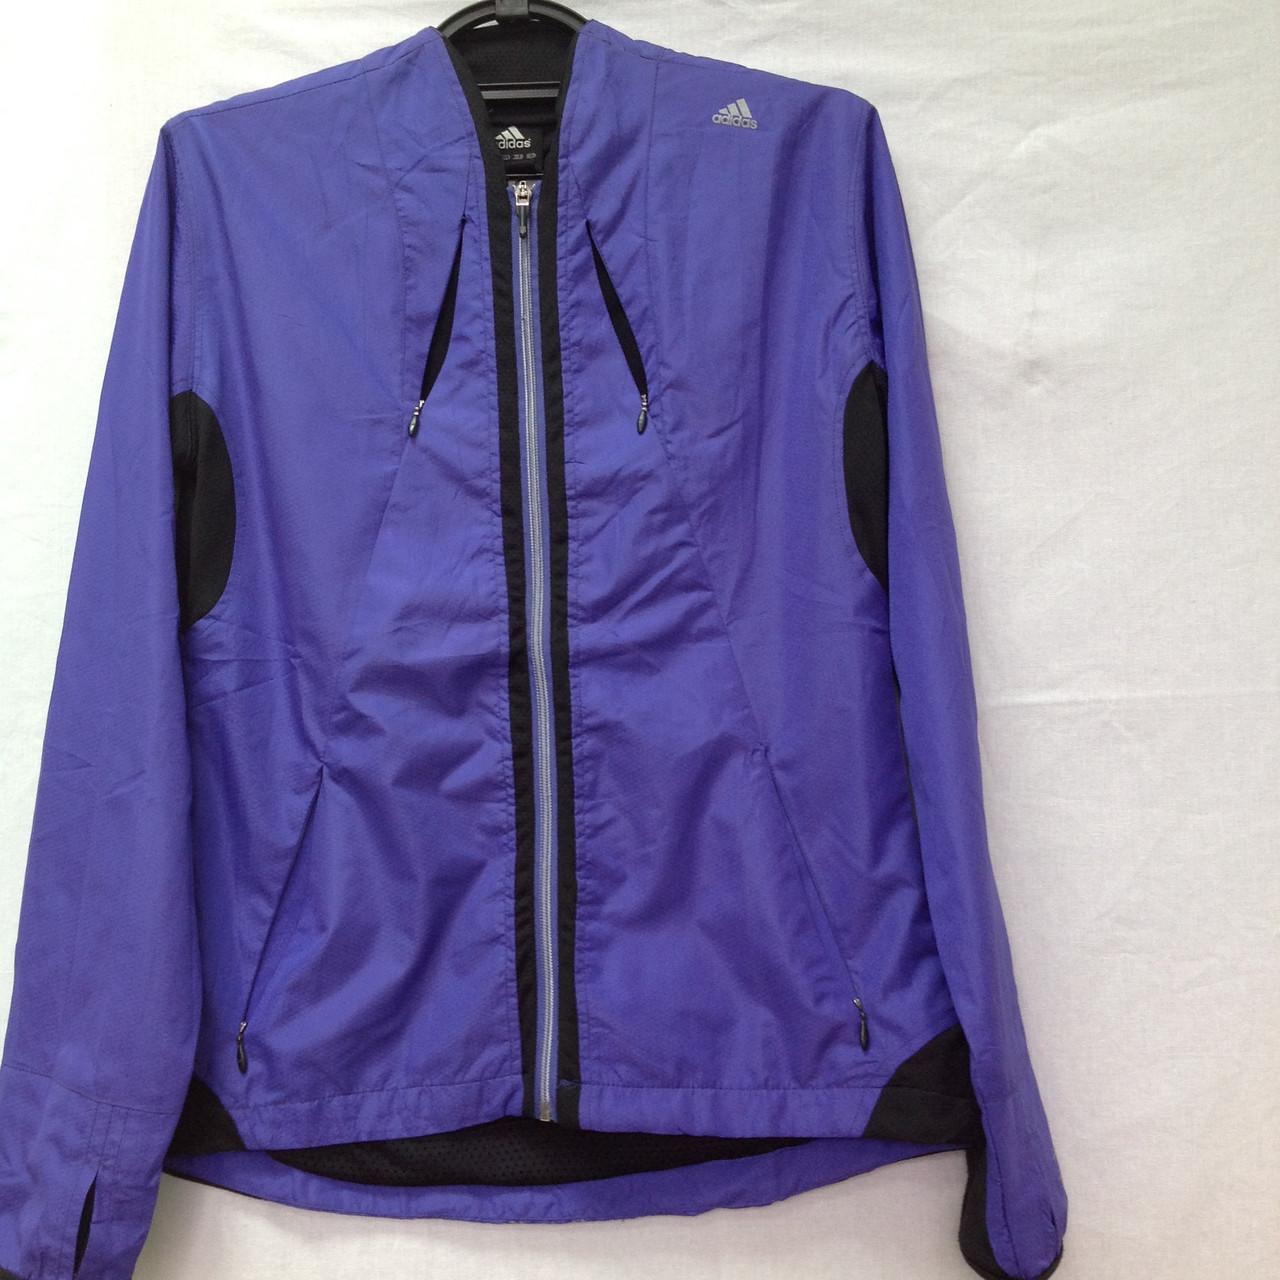 05c5ff6a9dcc Женская спортивная кофта Adidas ClimaCool, размер L.  продажа, цена ...